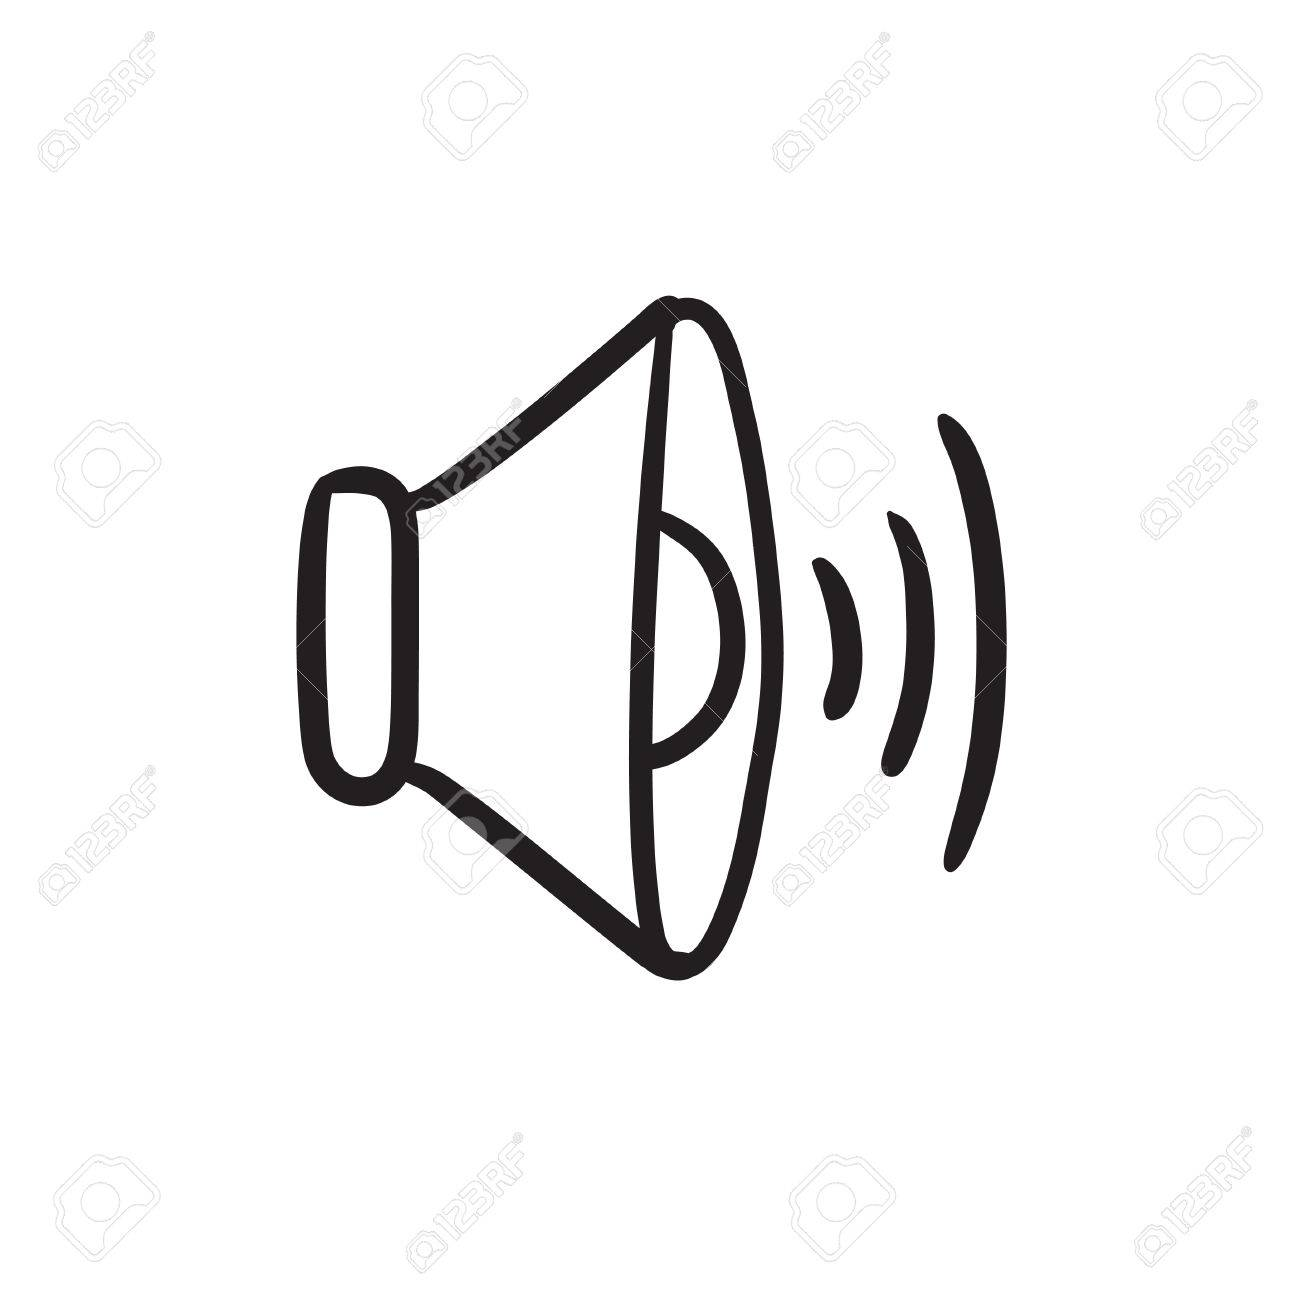 Lautsprecher-Lautstärke Vektor Skizze Symbol Auf Hintergrund ...